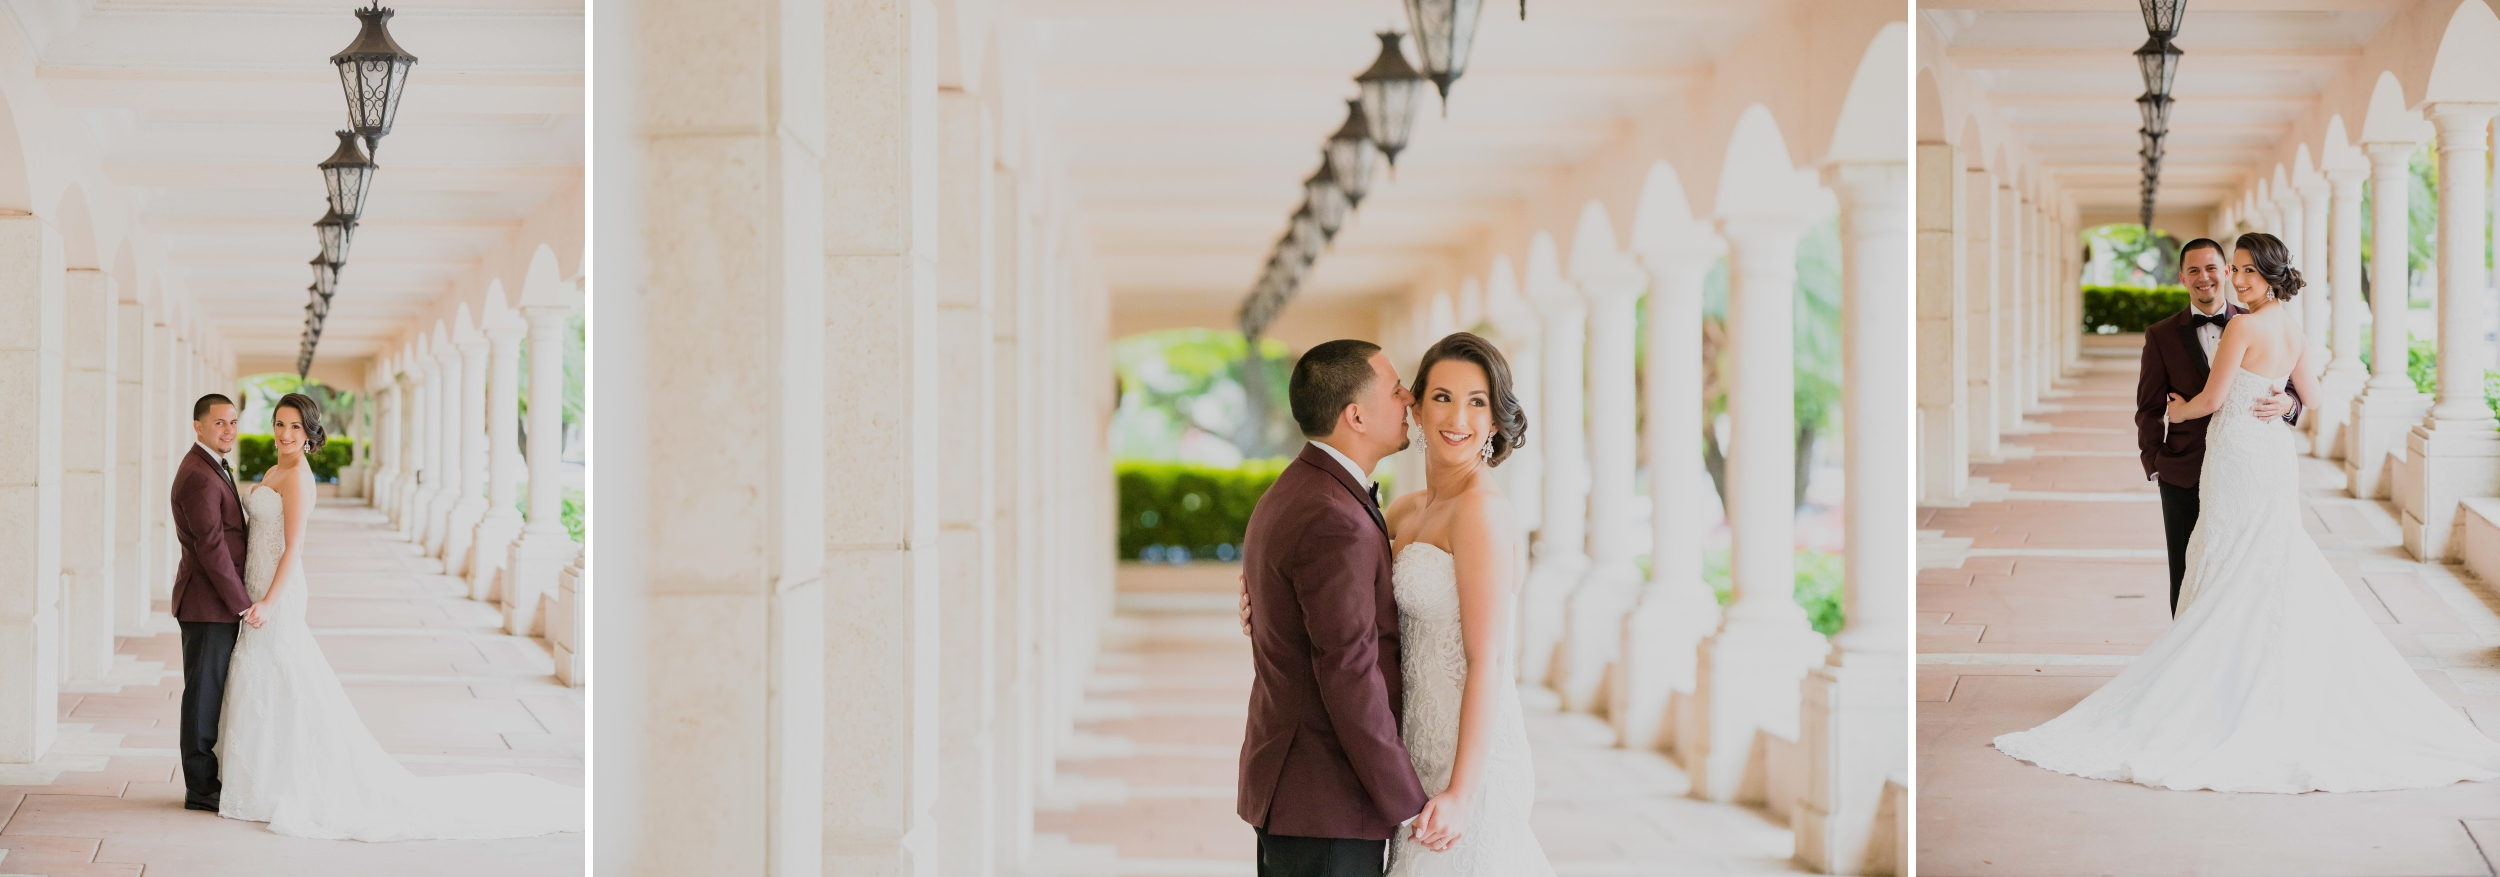 Wedding - Coco Plum - Coral Gables Congregational - Santy Martinez Photography 13.jpg